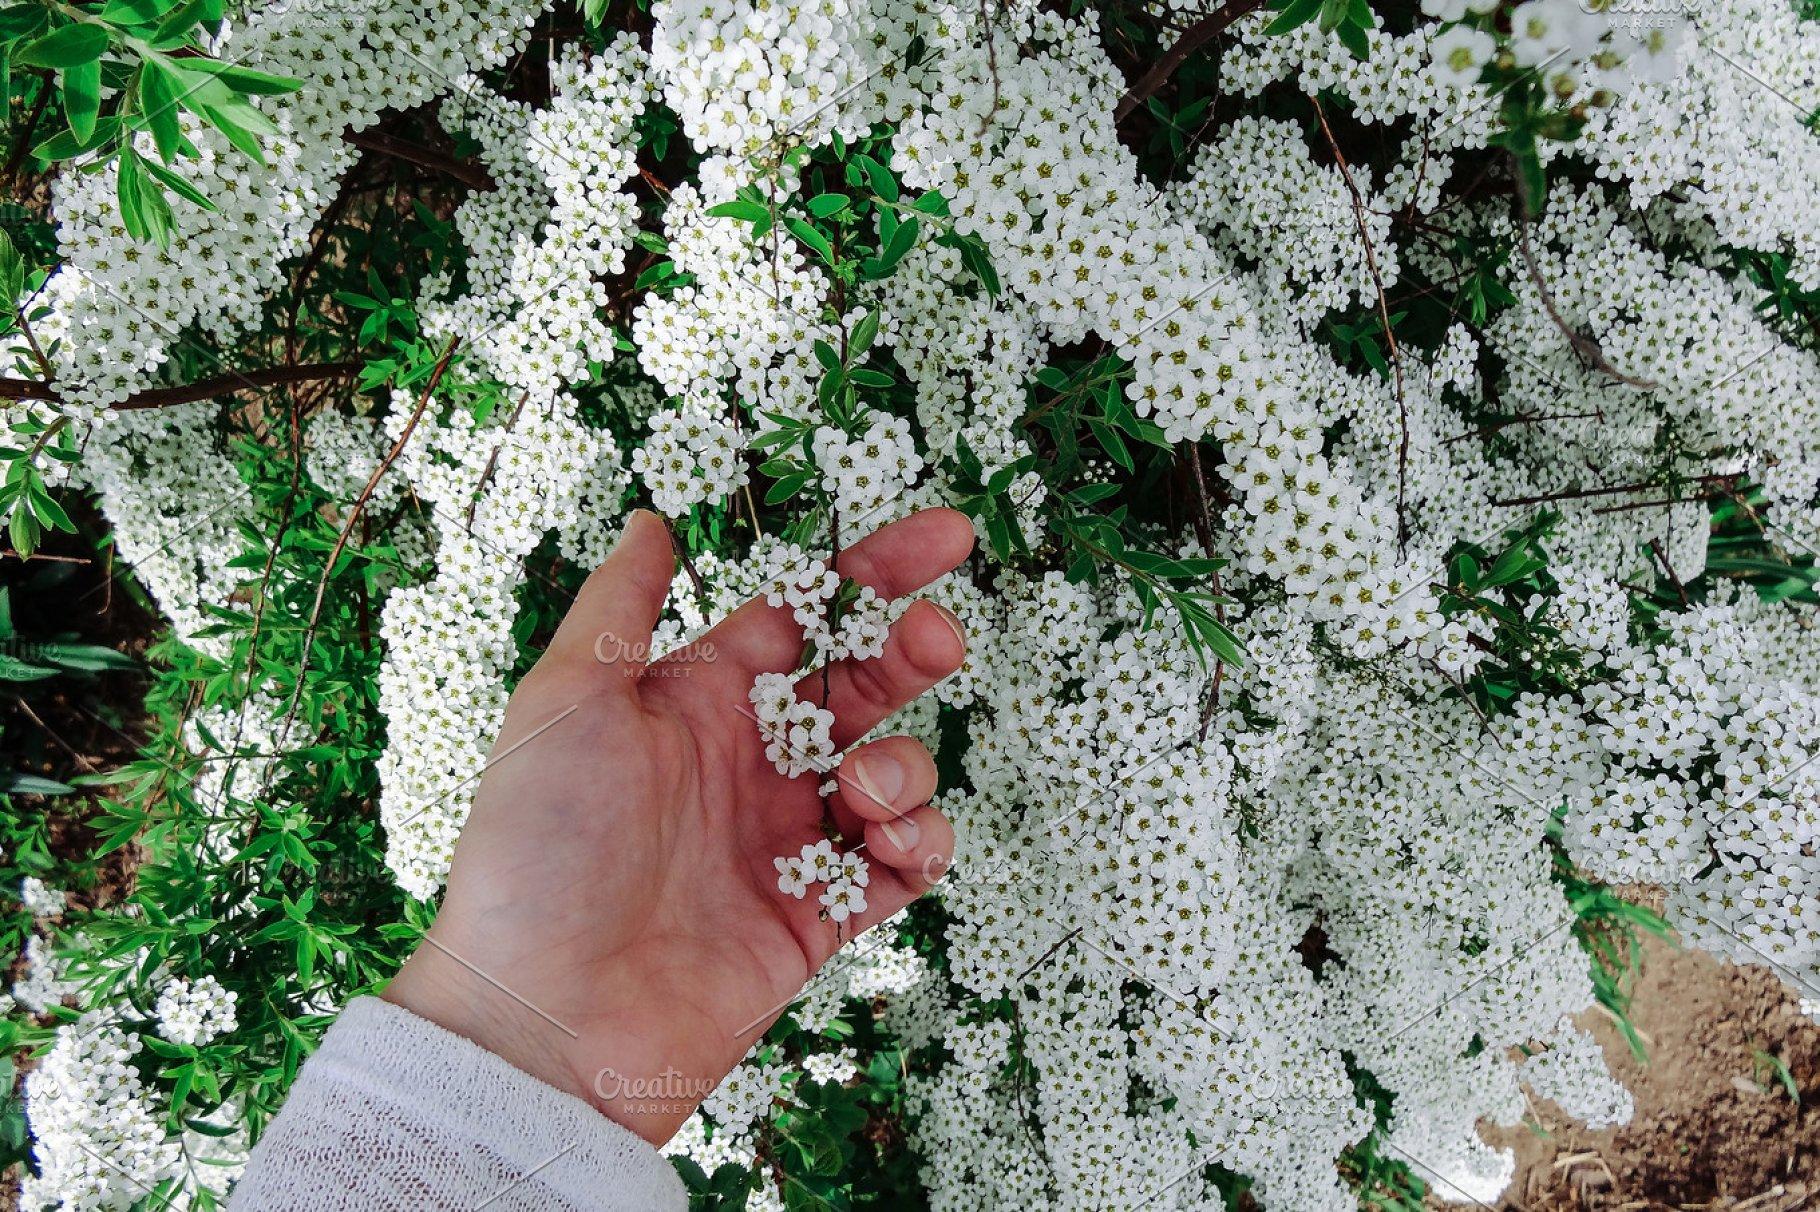 Spiraea Alpine Meadowsweet Spring Flower White Blossoming Shrub